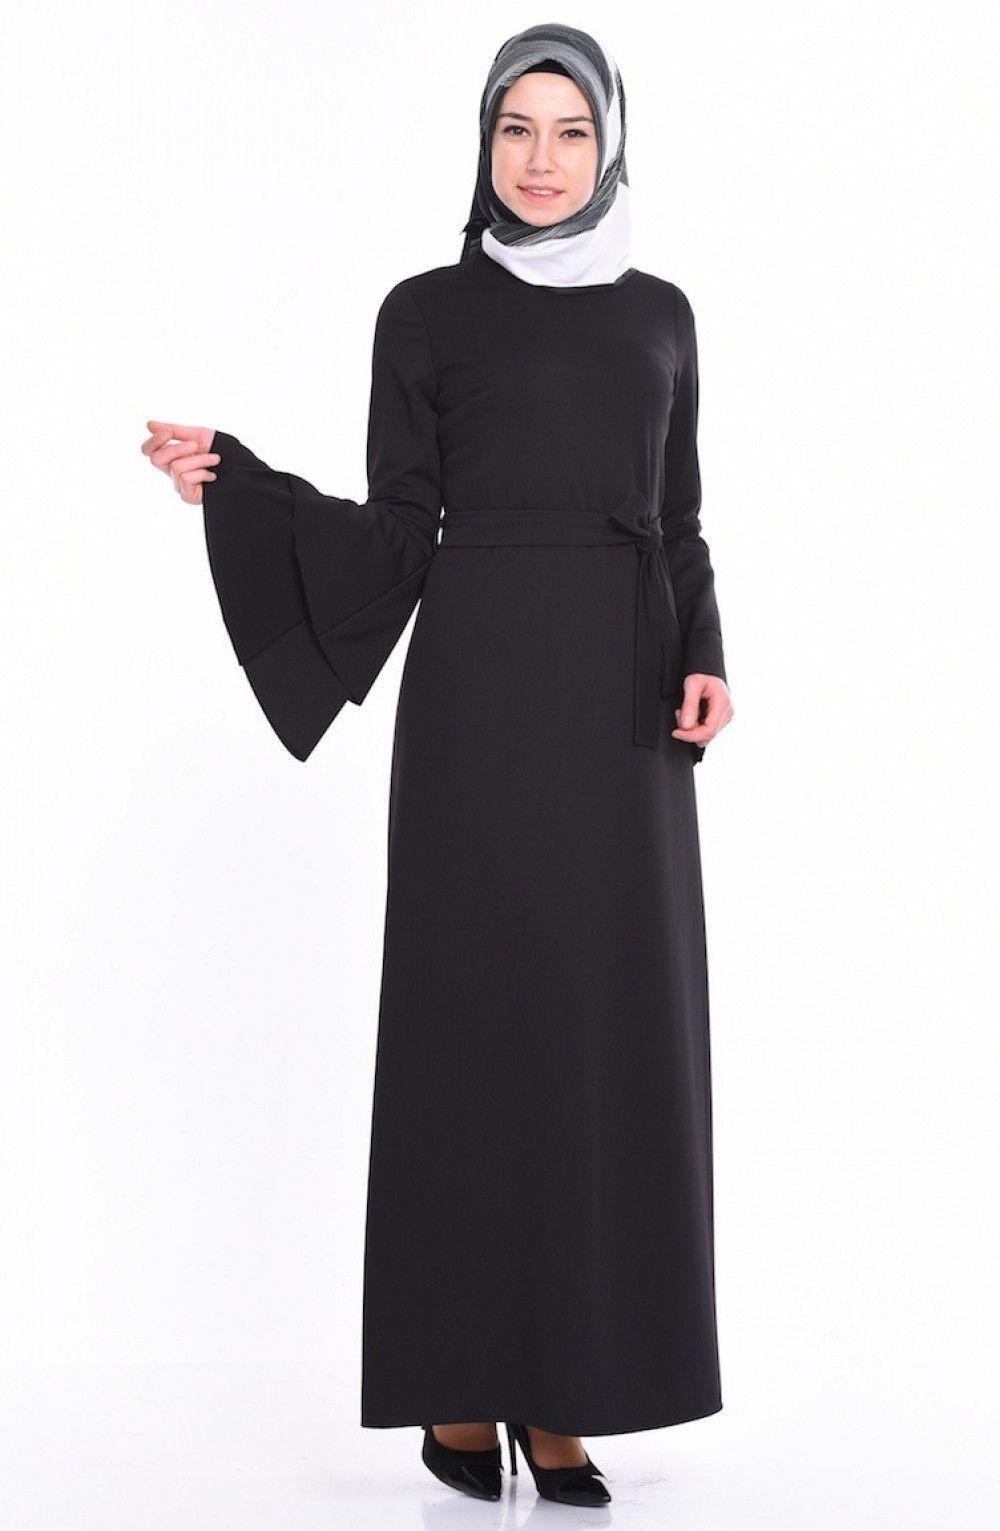 Sefamerve Genis Kol Tesettur Kalem Elbise Modelleri Moda Tesettur Giyim Elbise Modelleri Kalem Elbise Elbise